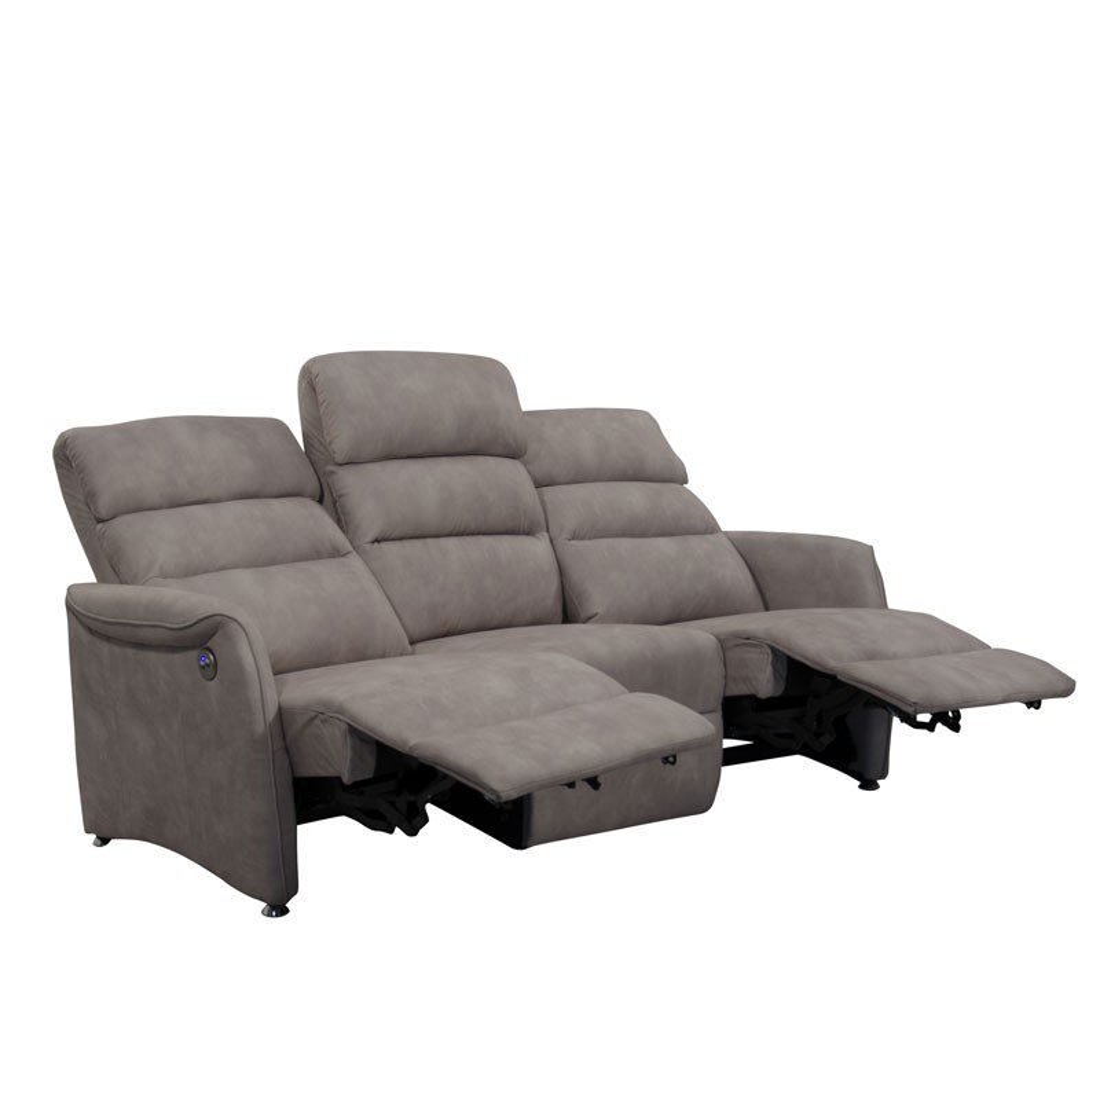 canap de relax lectrique 3p mastic softy univers salon. Black Bedroom Furniture Sets. Home Design Ideas